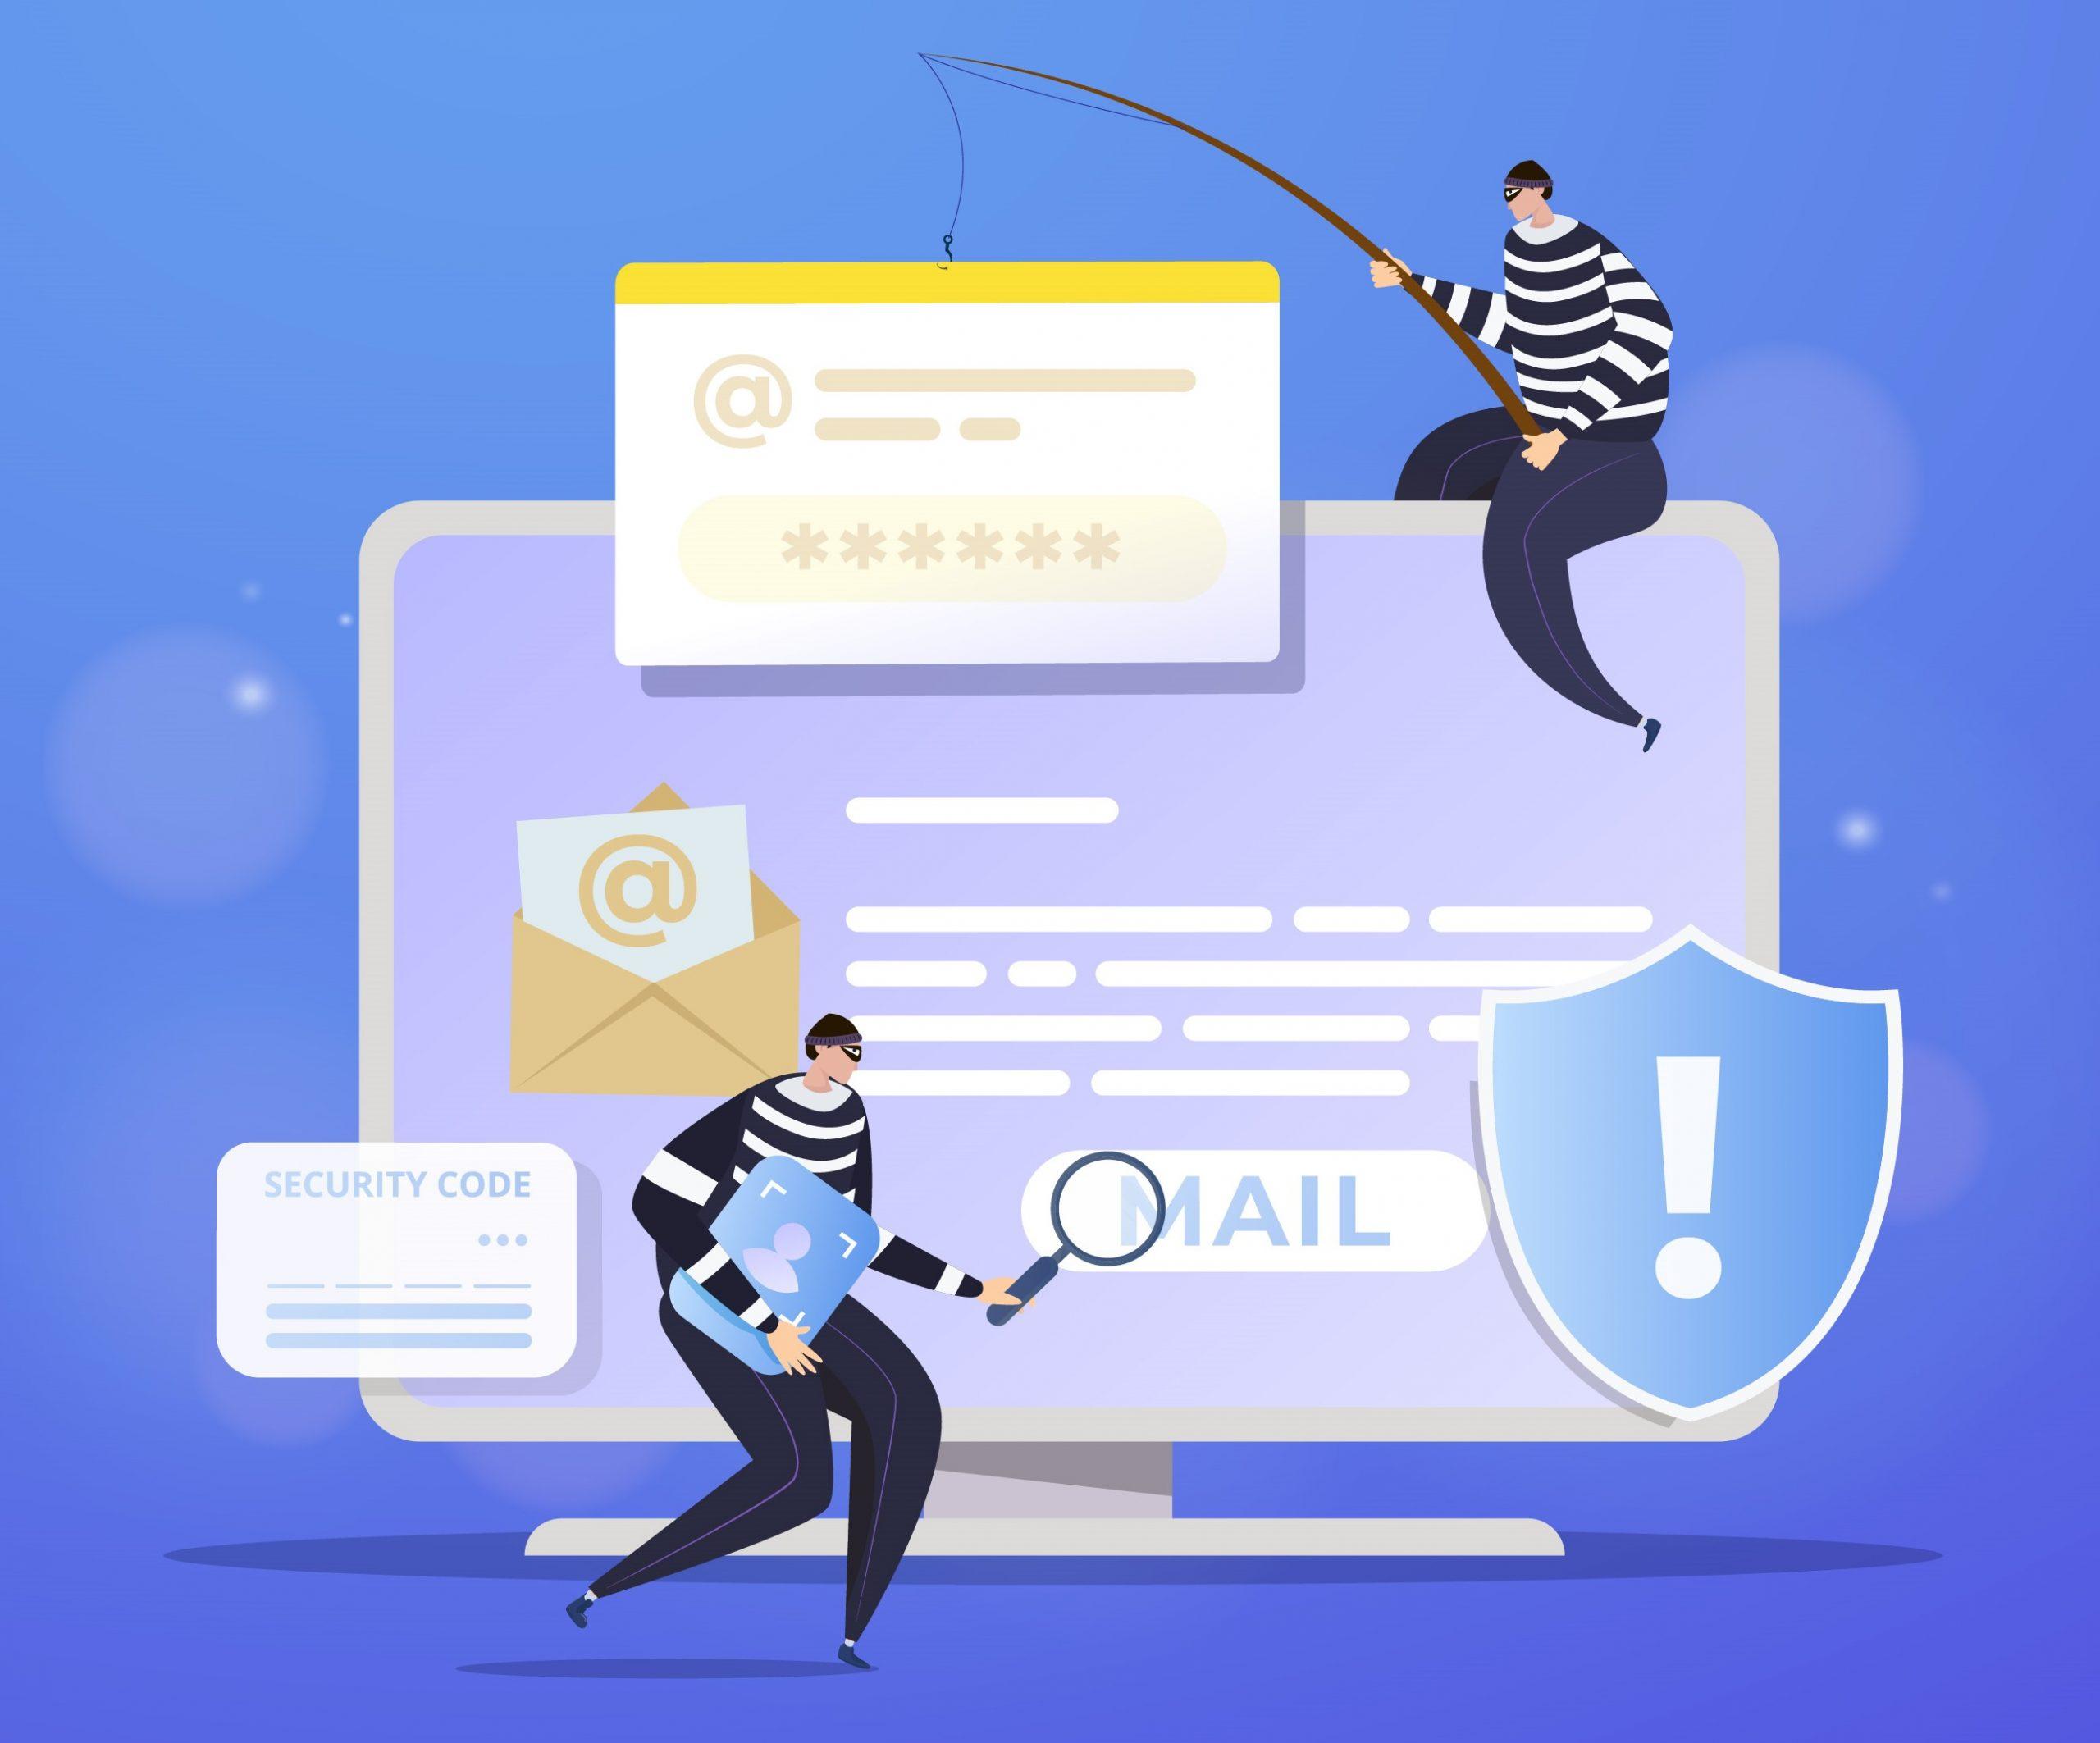 Cyber criminal phishing via email